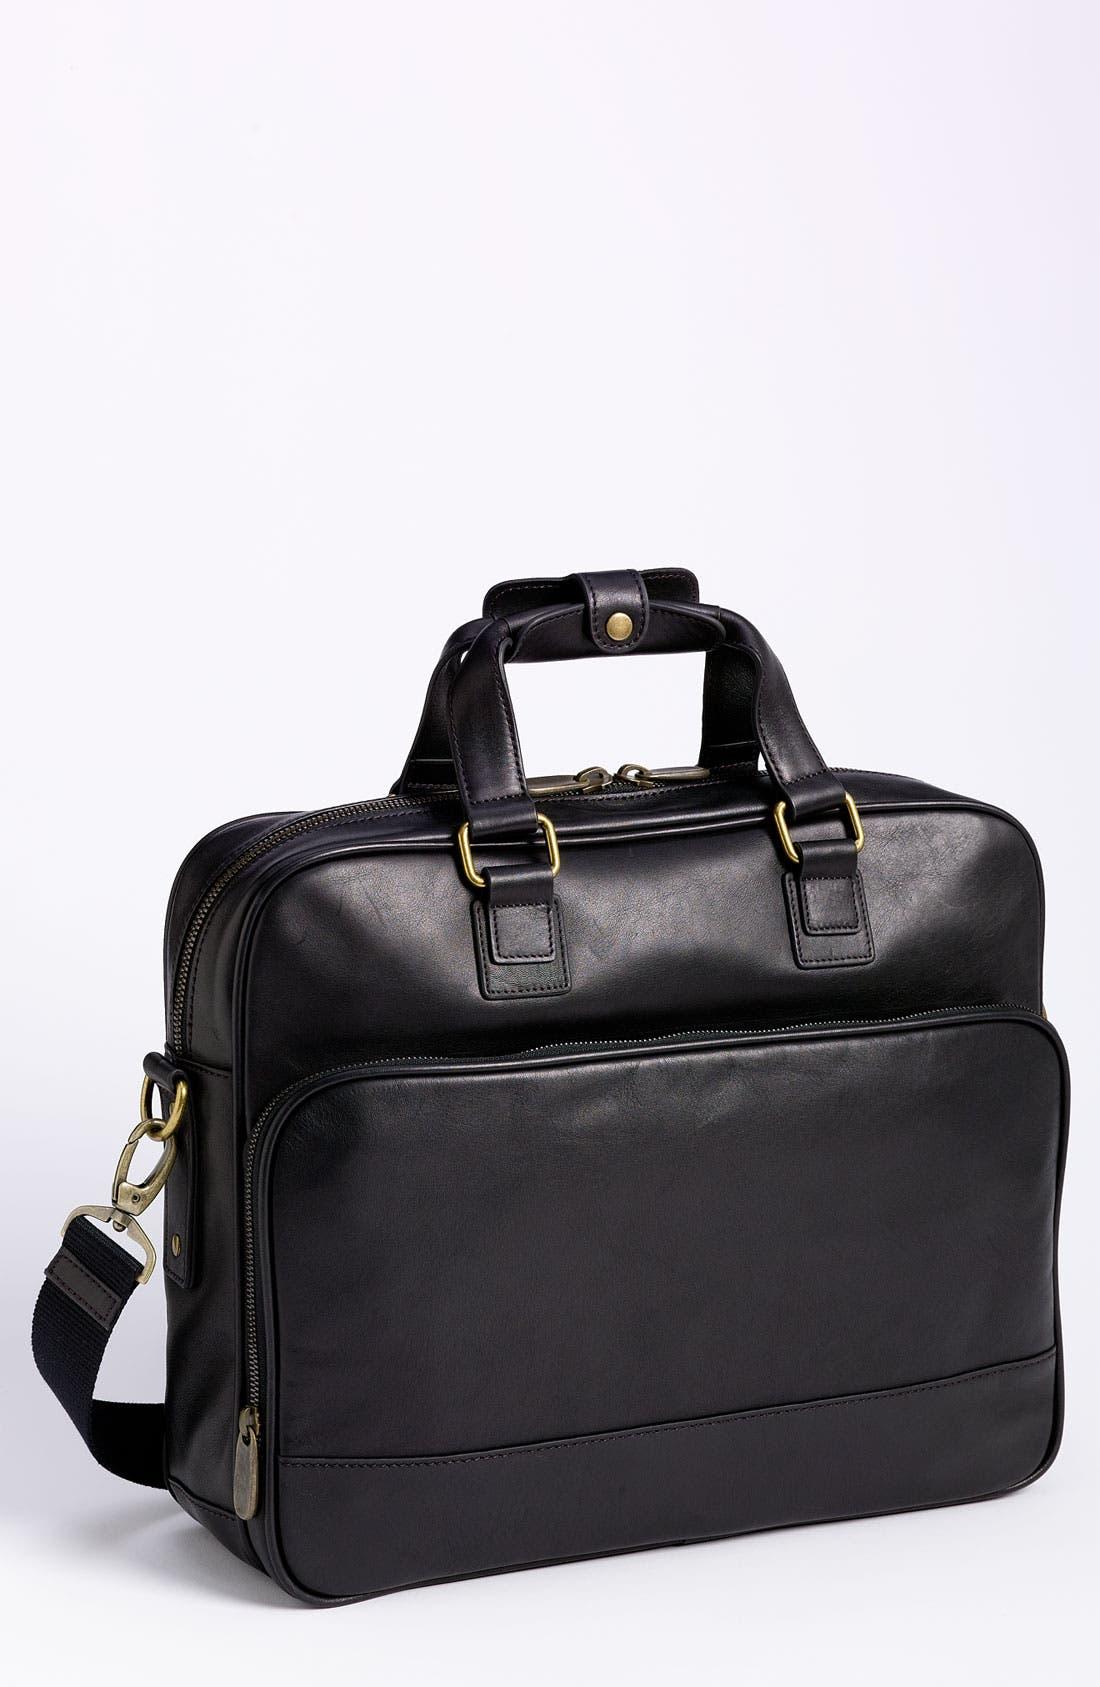 Top Zip Leather Briefcase,                         Main,                         color, Black